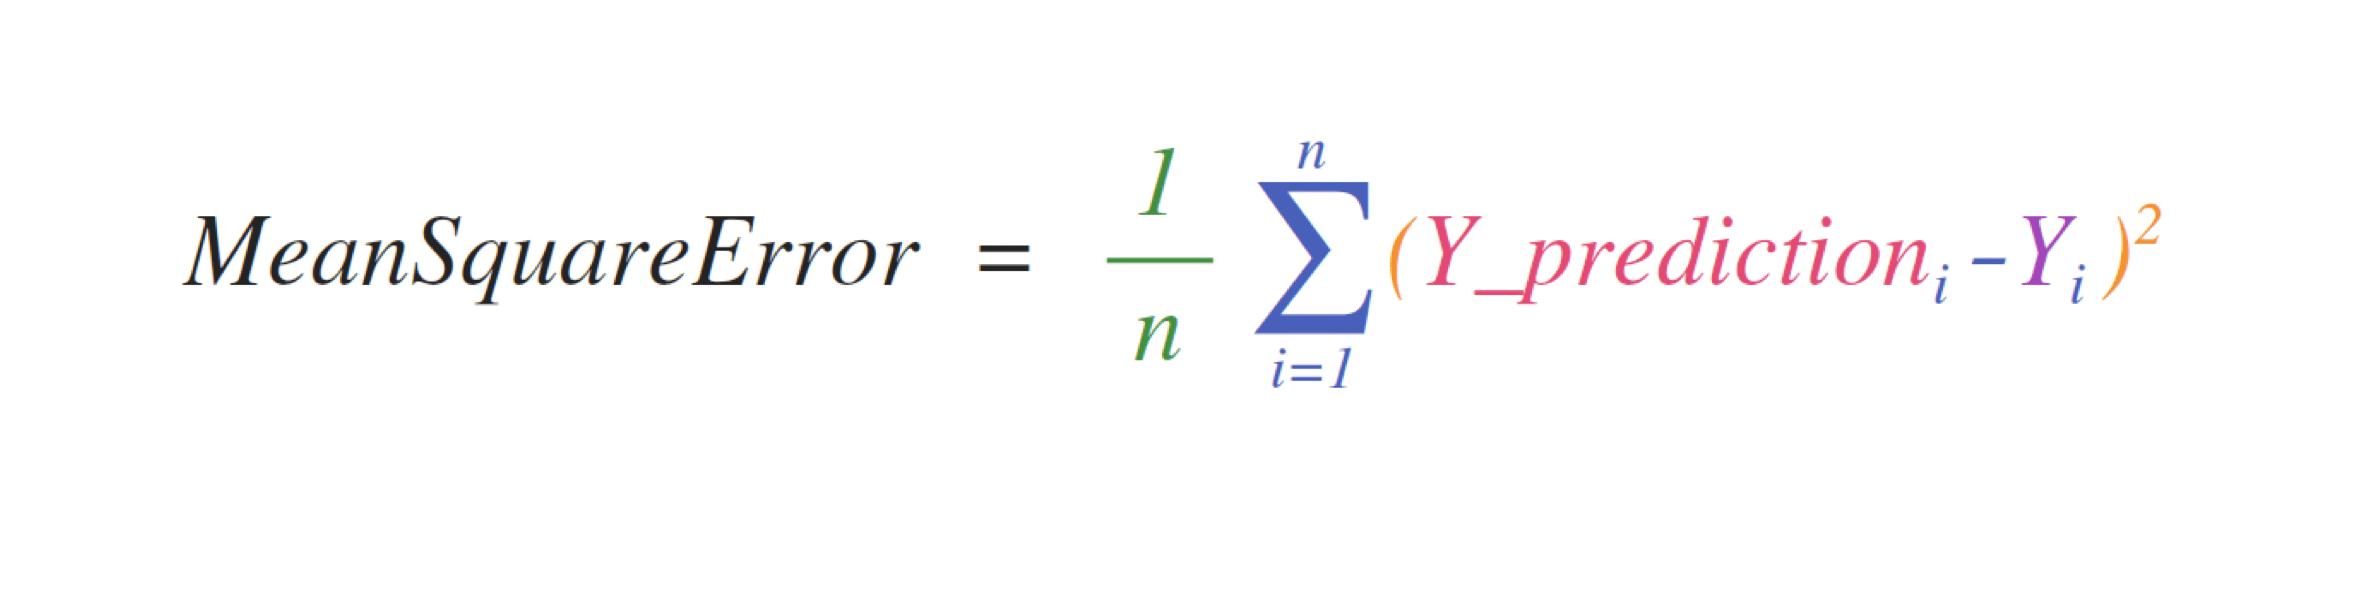 ../_images/np_MSE_formula.png